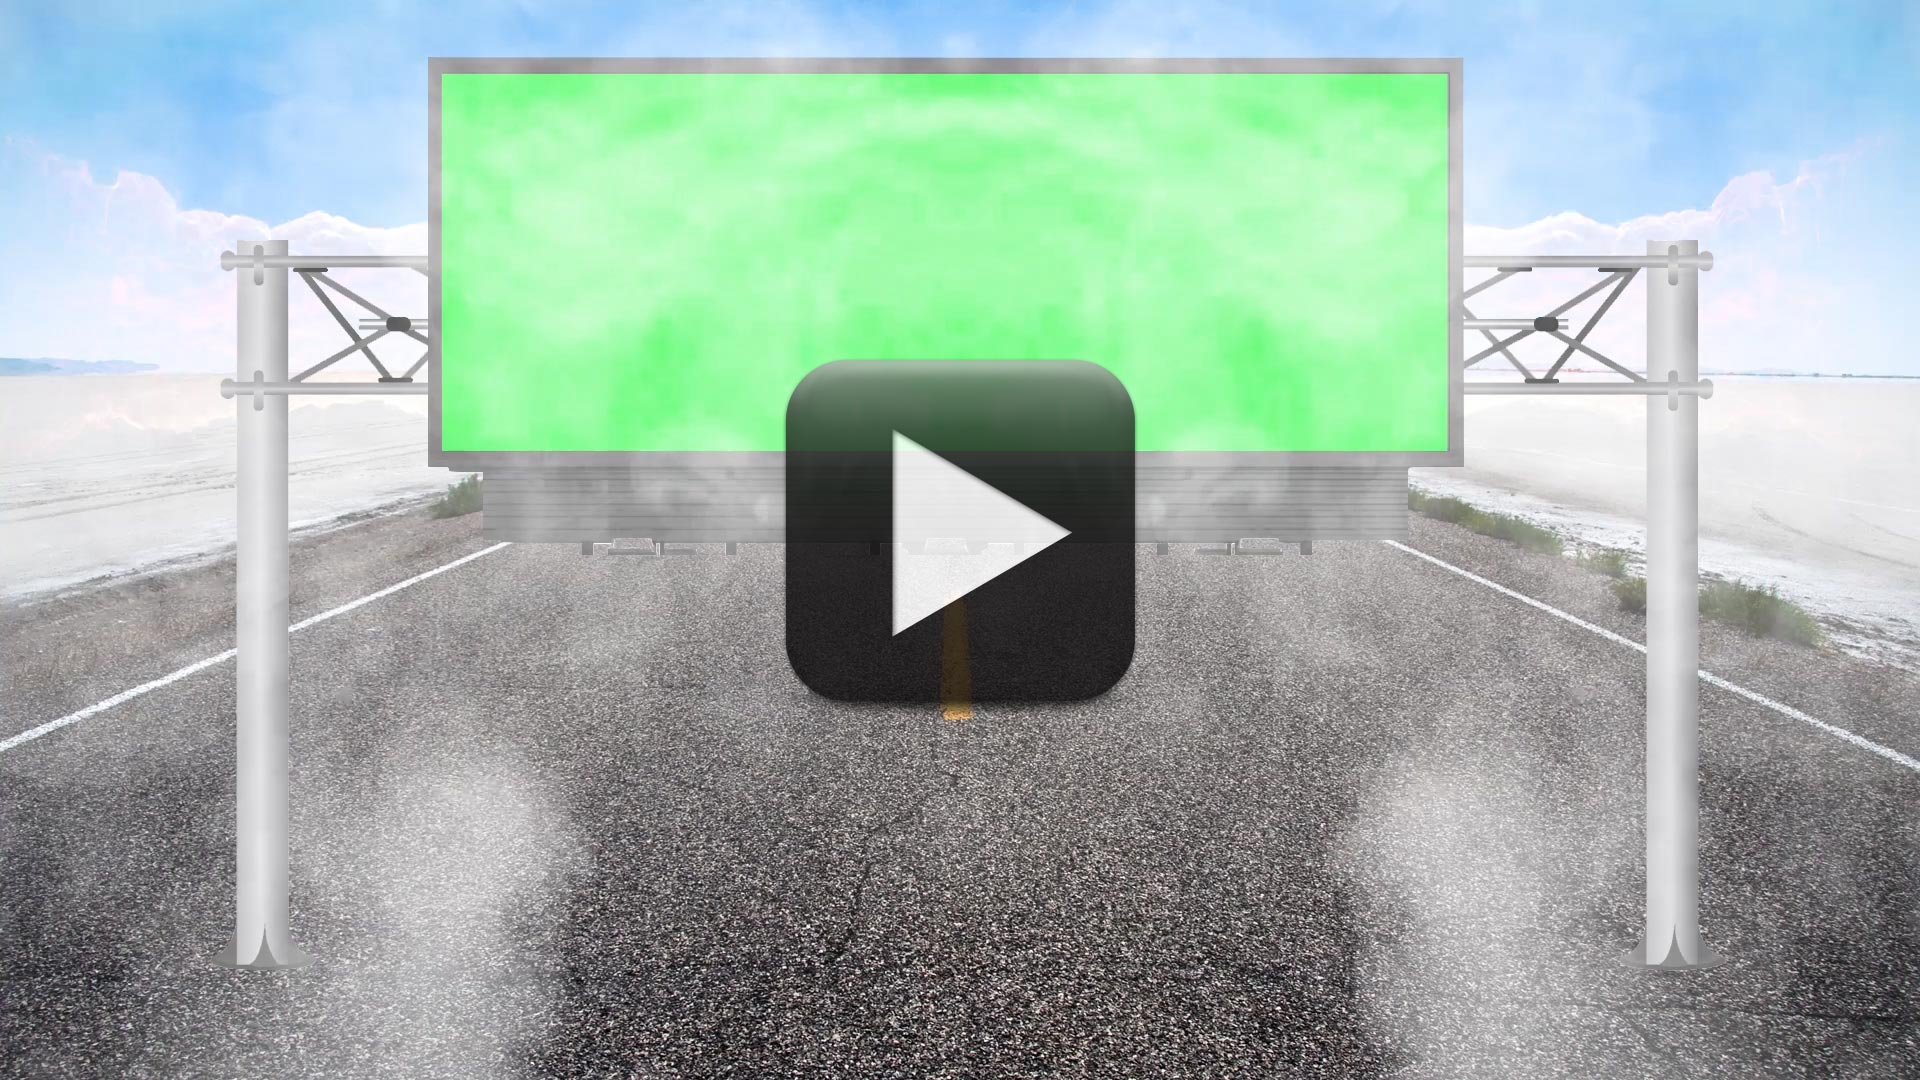 HD wedding background 1080p-Billboard Green Screen with Cool Smoke Animation